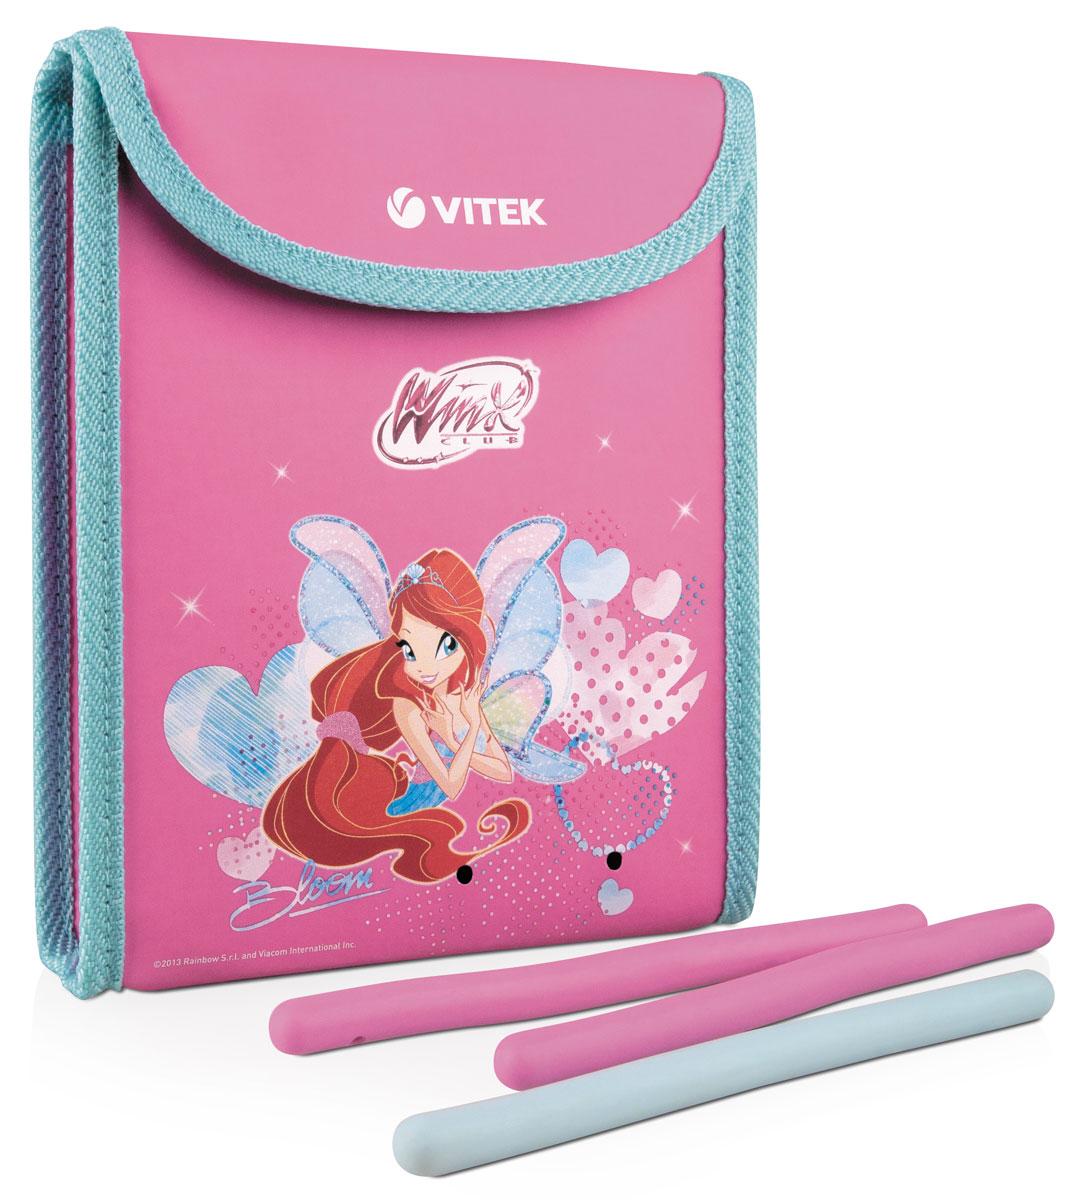 Vitek Winx 2052 Bloom набор для укладки волос - Электробигуди